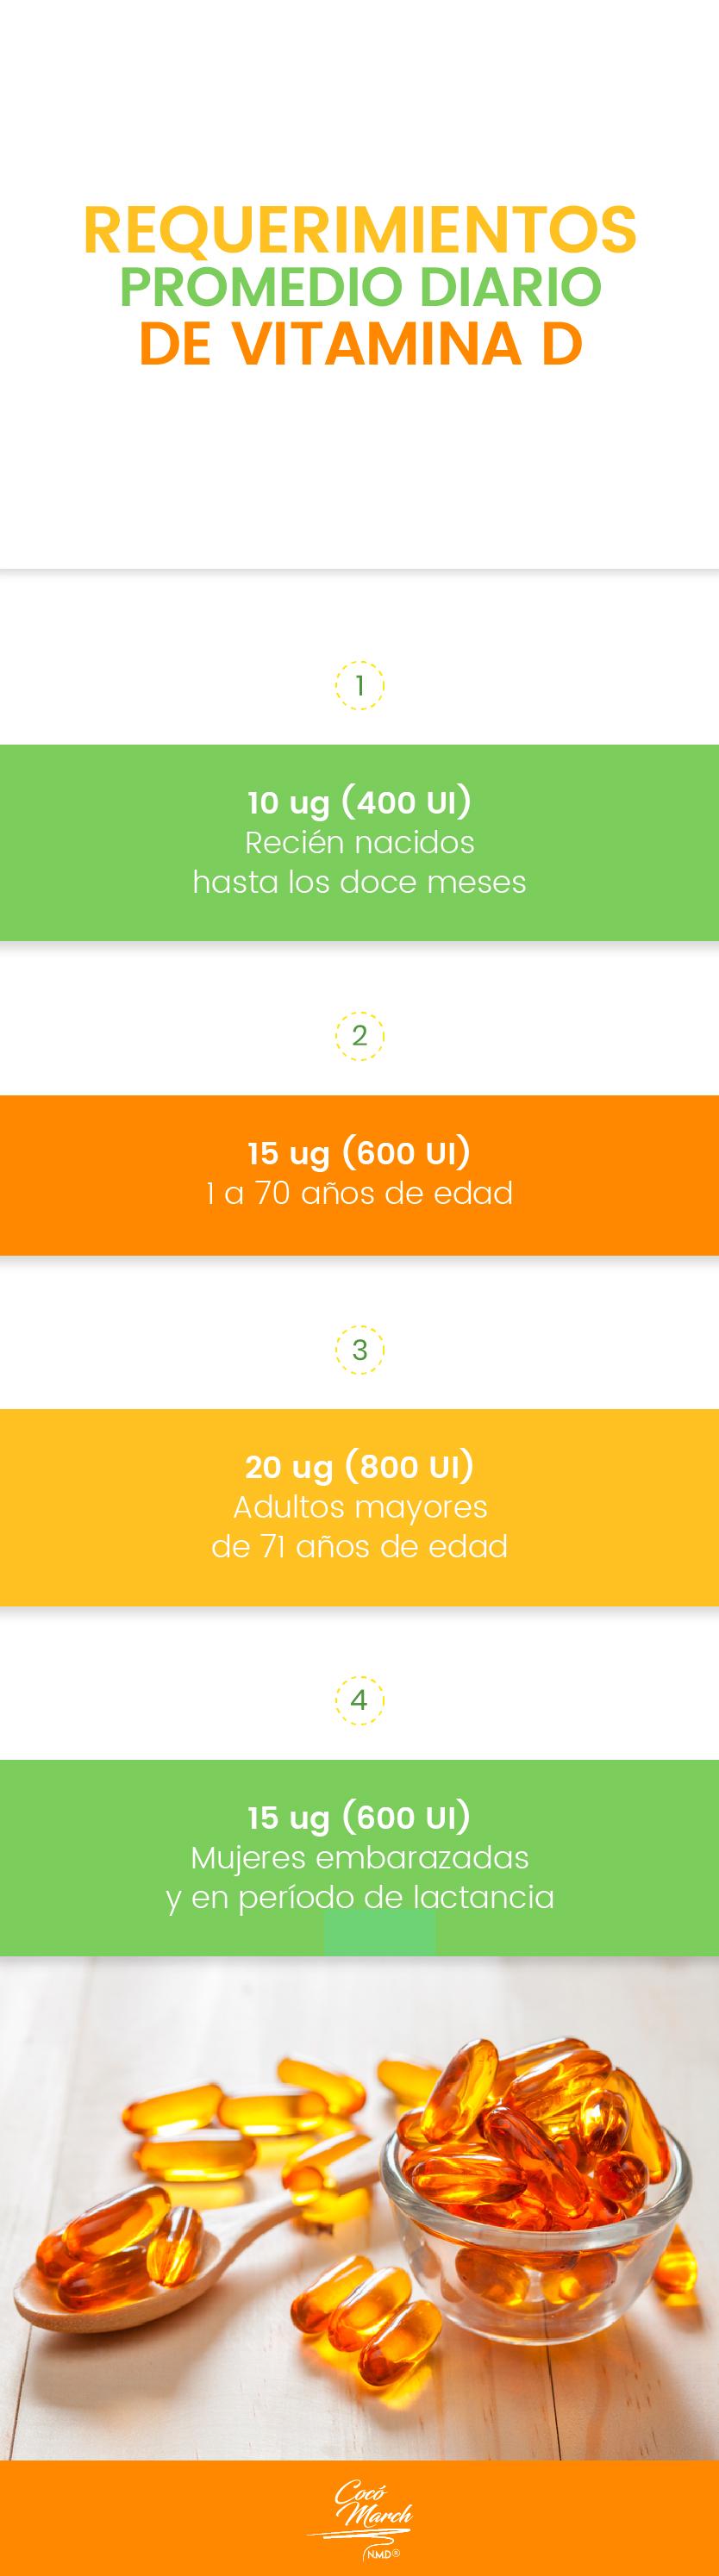 requerimientos-promedio-diario-de-vitamina-d